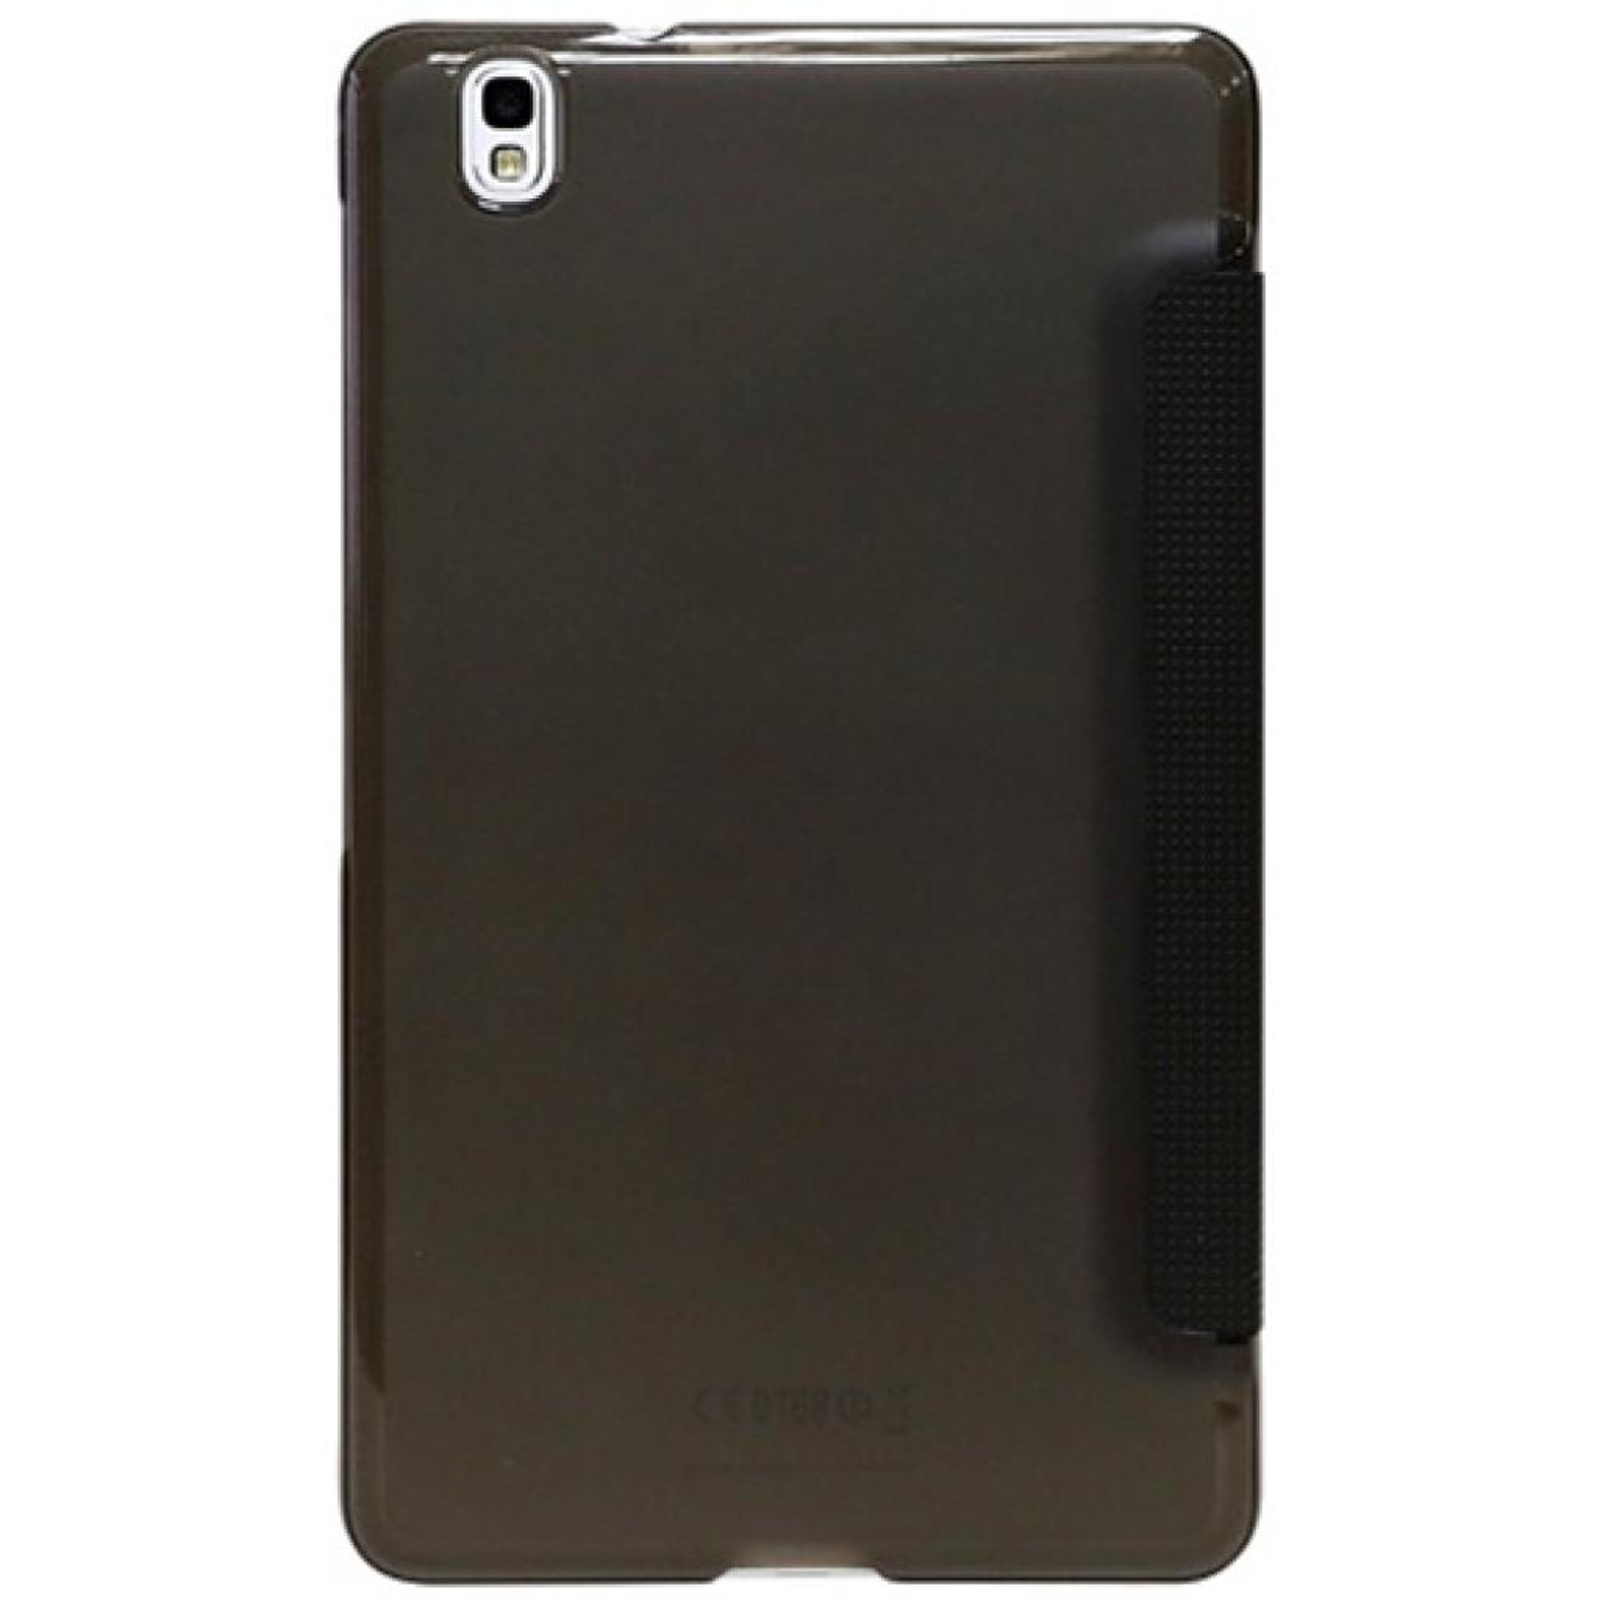 Чехол для планшета Rock Samsung Galaxy Tab Pro 8.4 New elegant series black (Tab Pro 8.4-62881) изображение 2